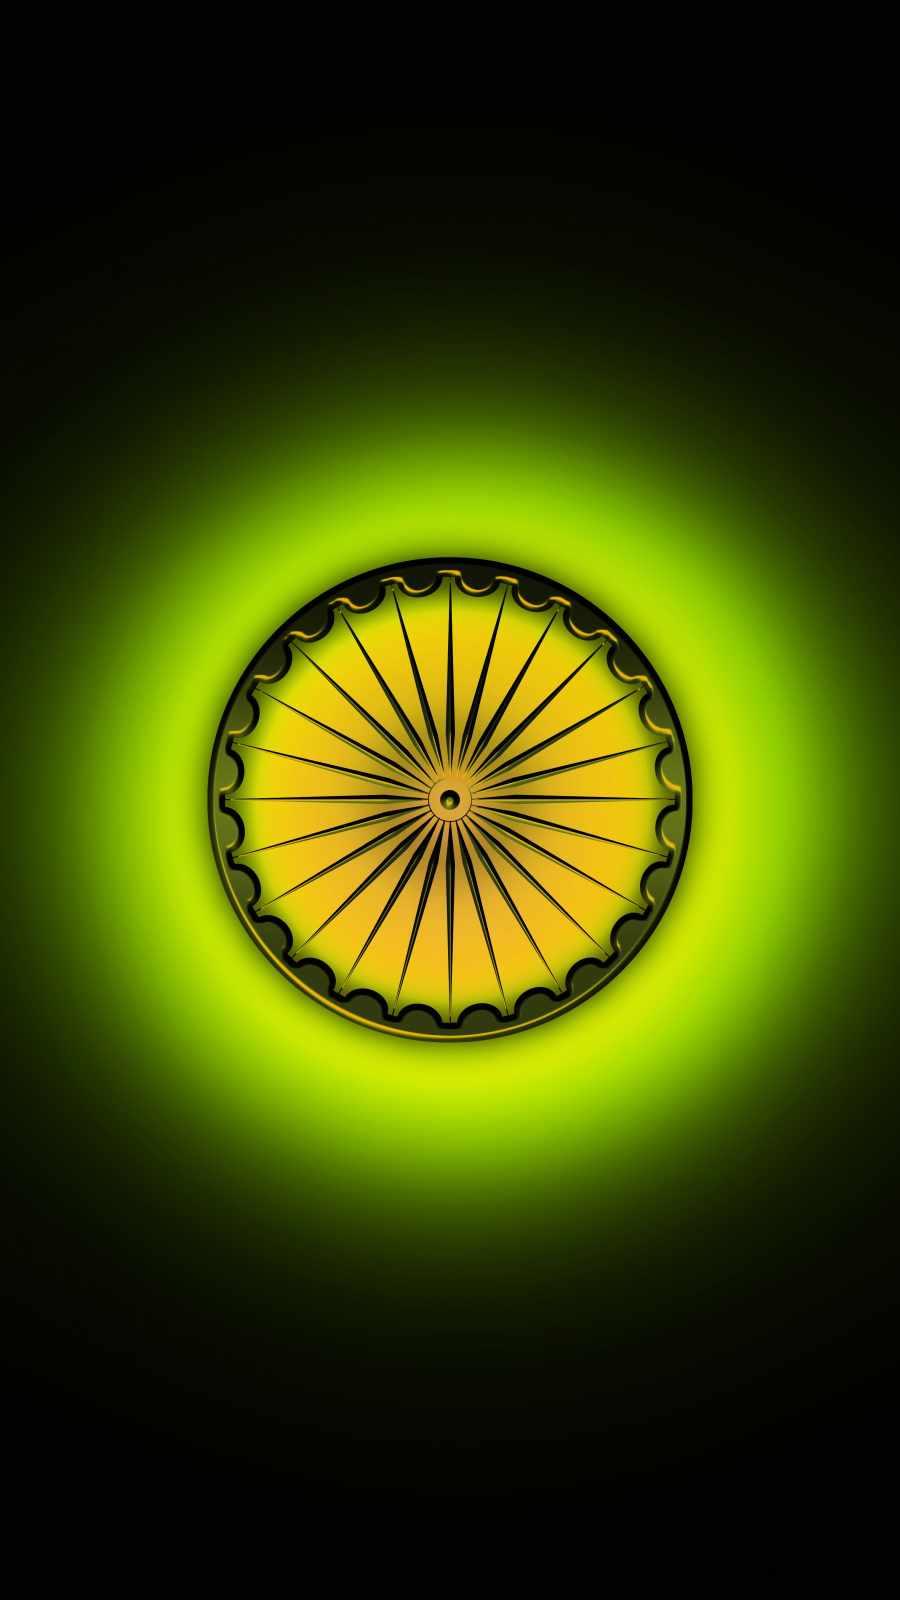 Indian flag wheel